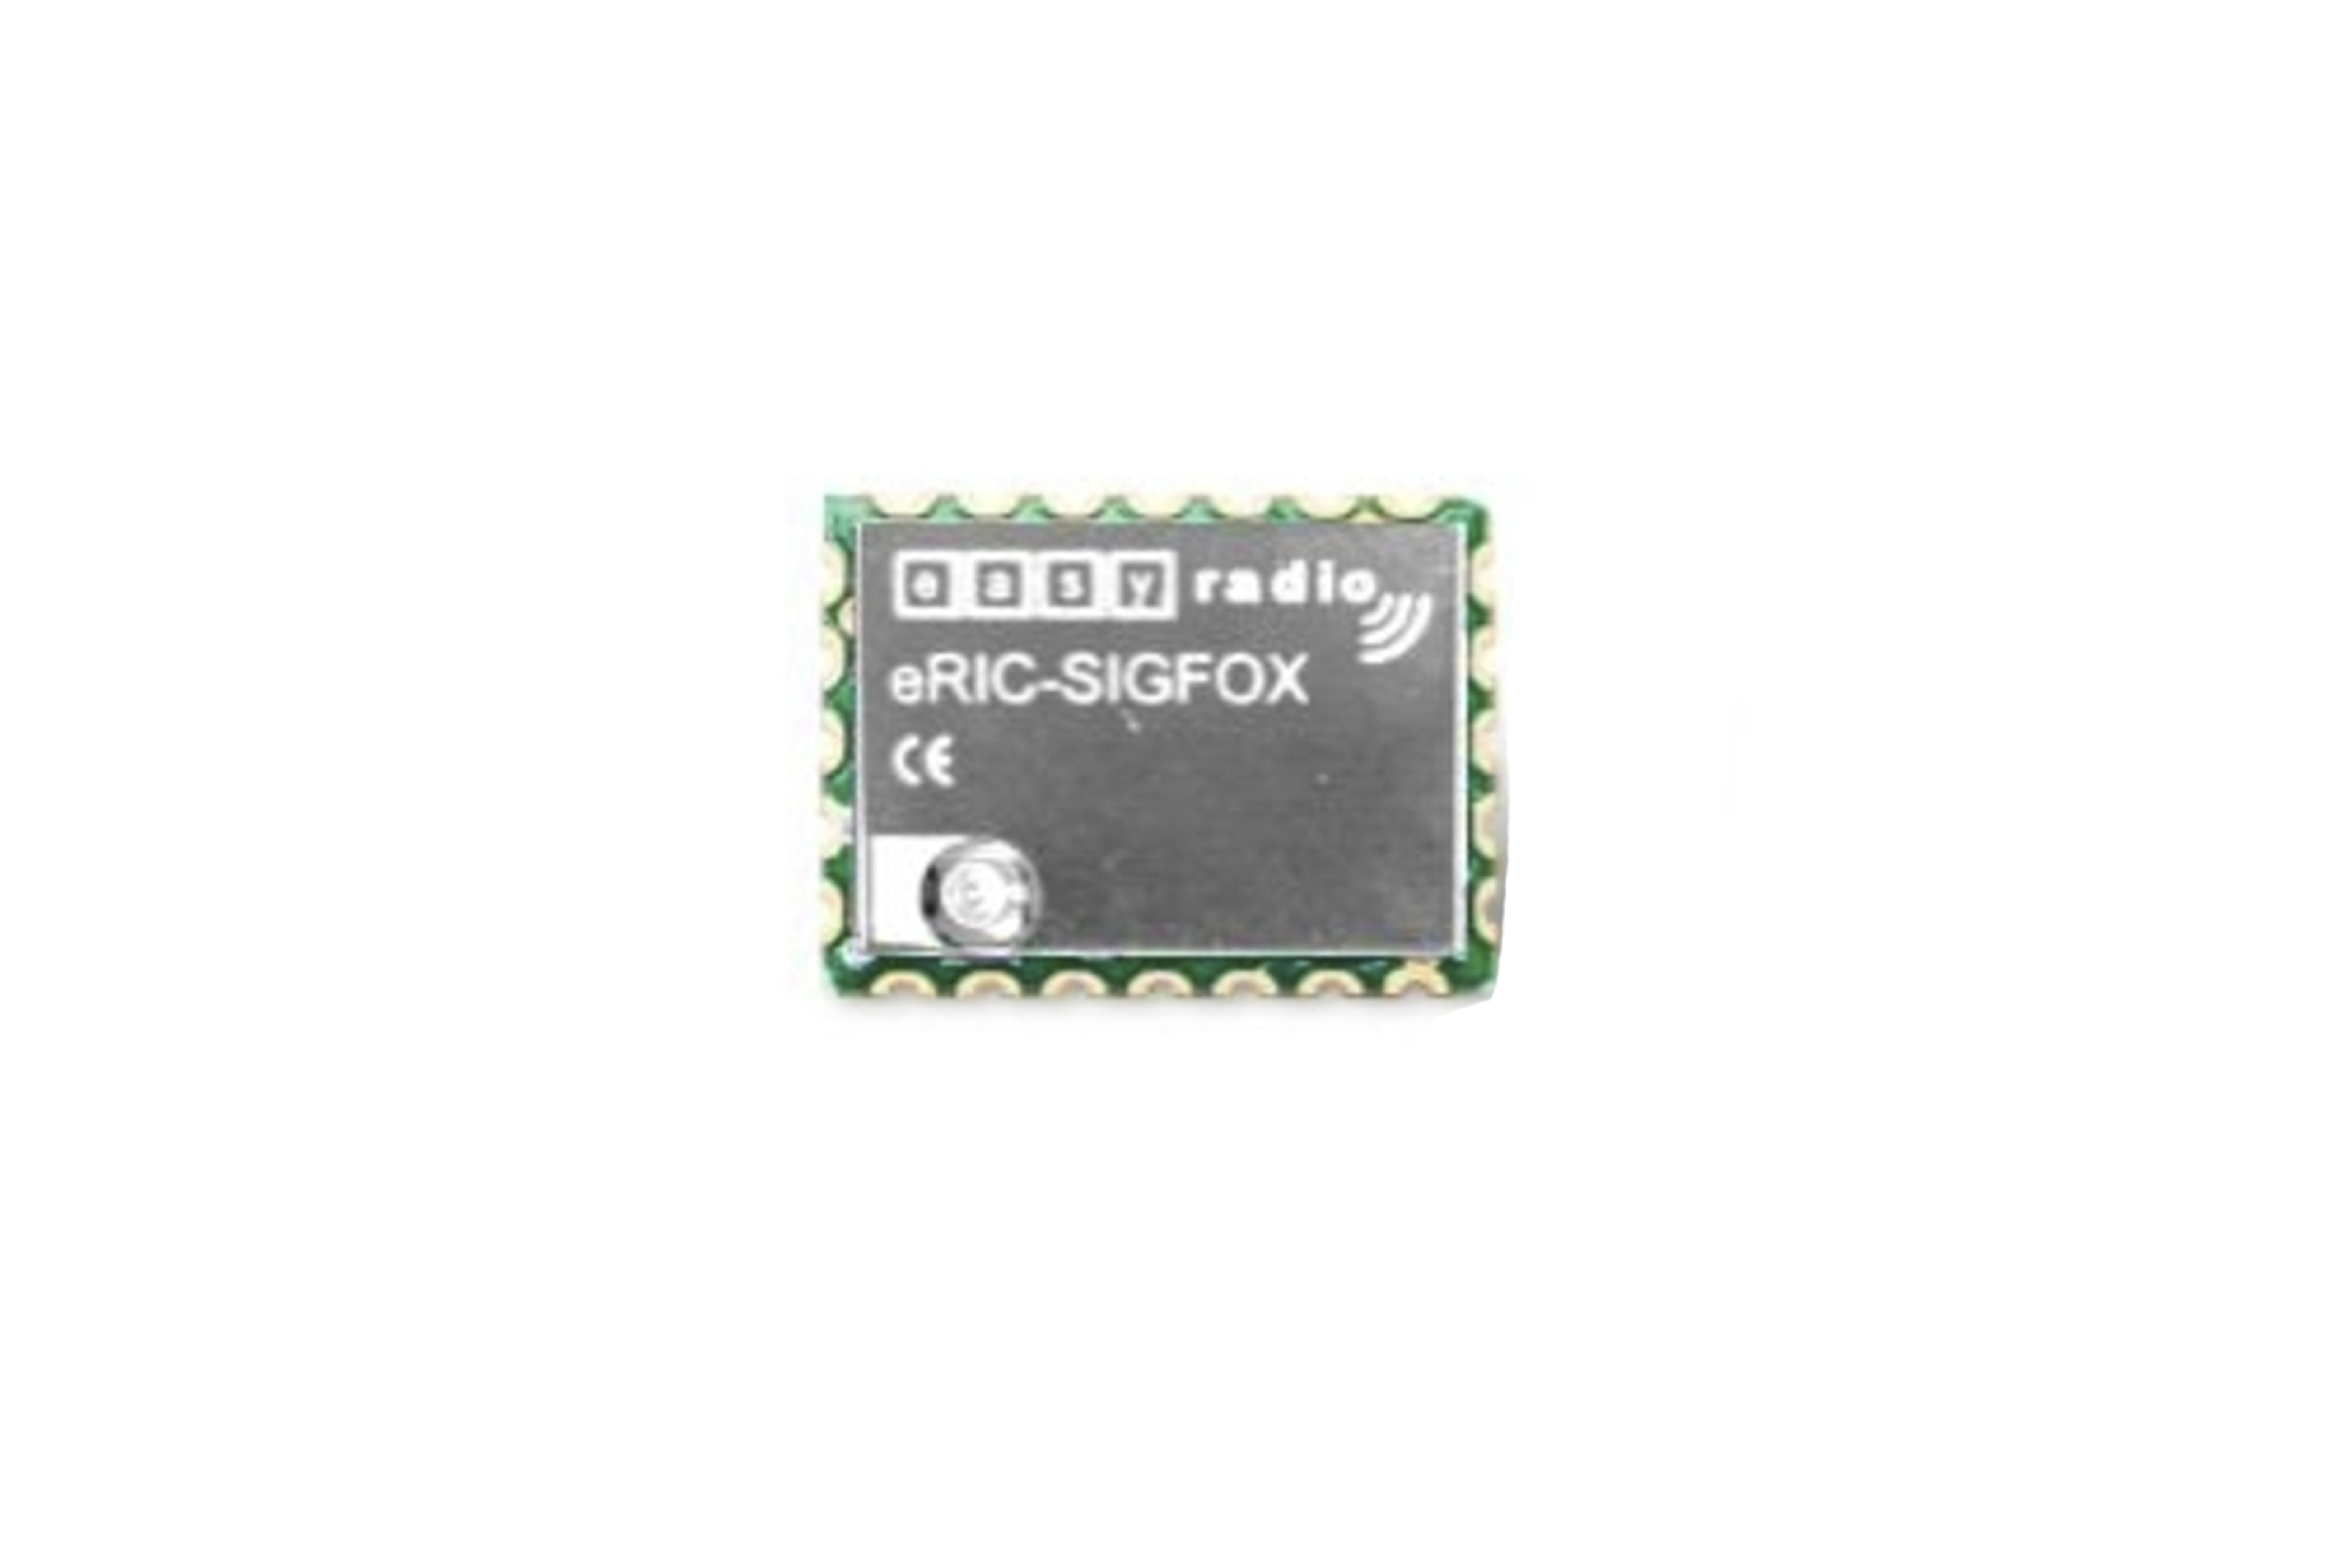 Modulo ricetrasmettitore SIGFOX 868MHz